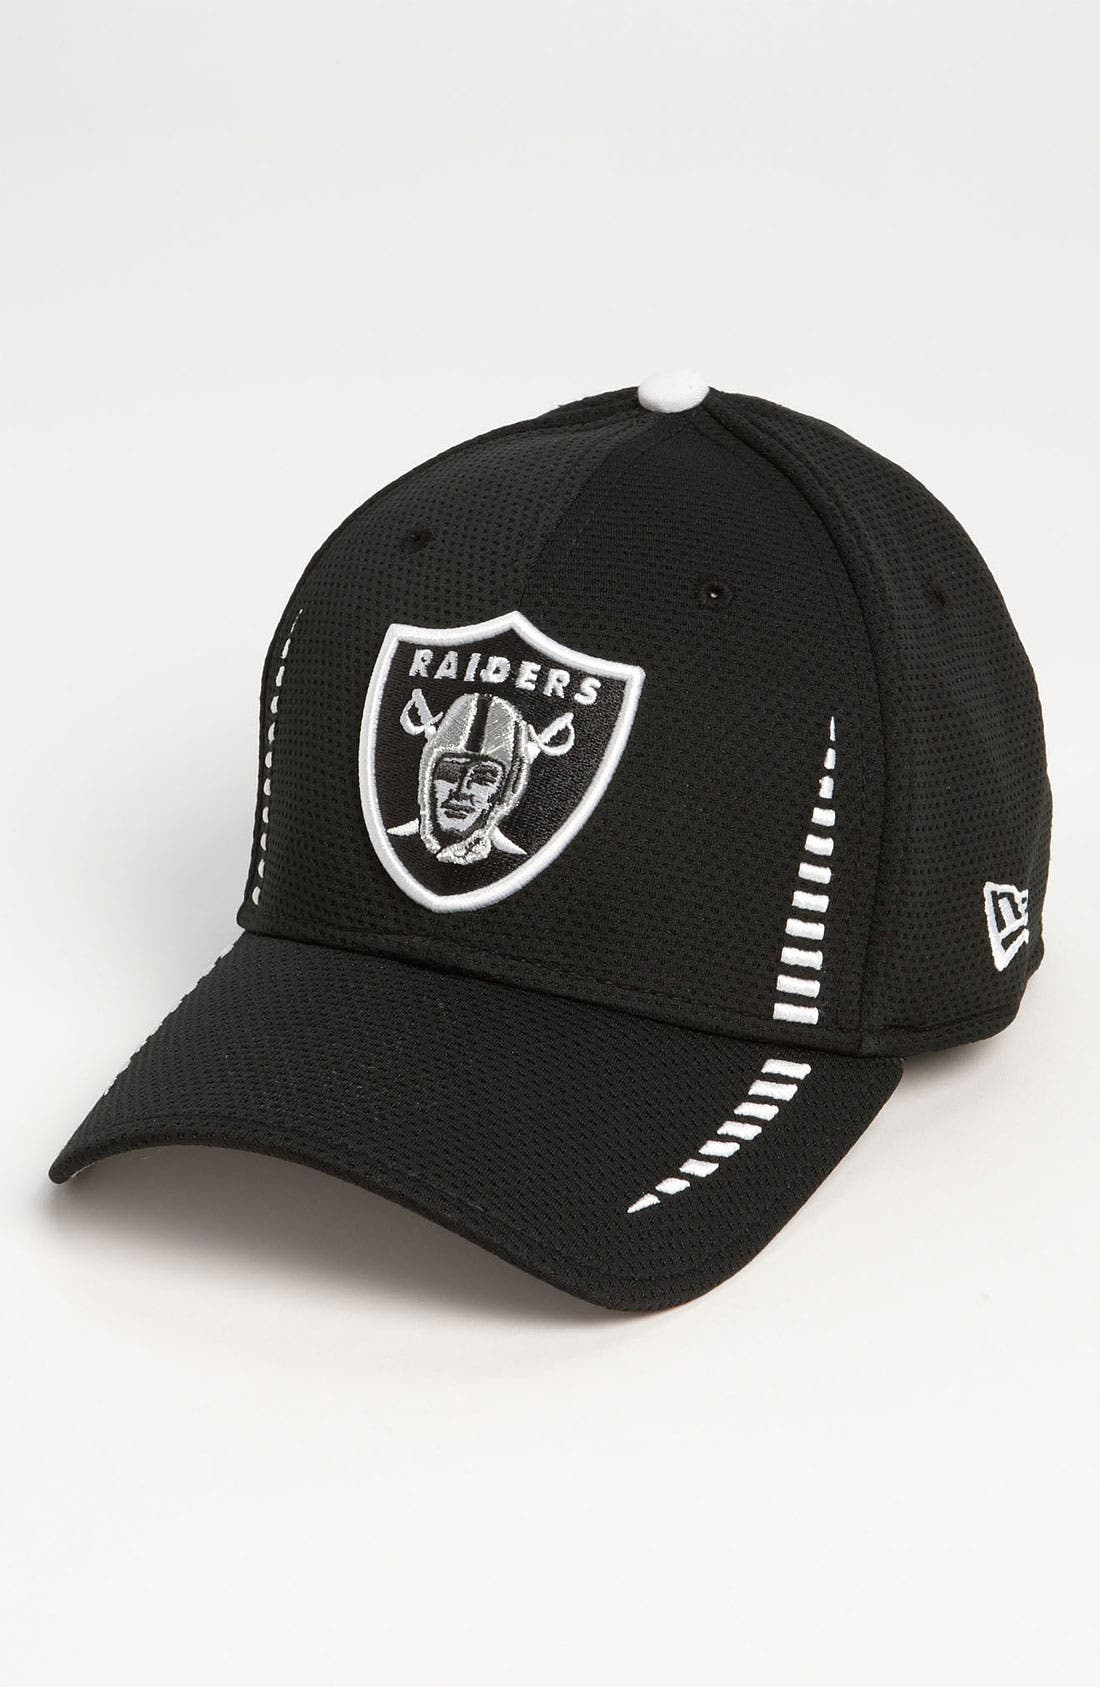 Alternate Image 1 Selected - New Era Cap 'Training Camp - Oakland Raiders' Baseball Cap